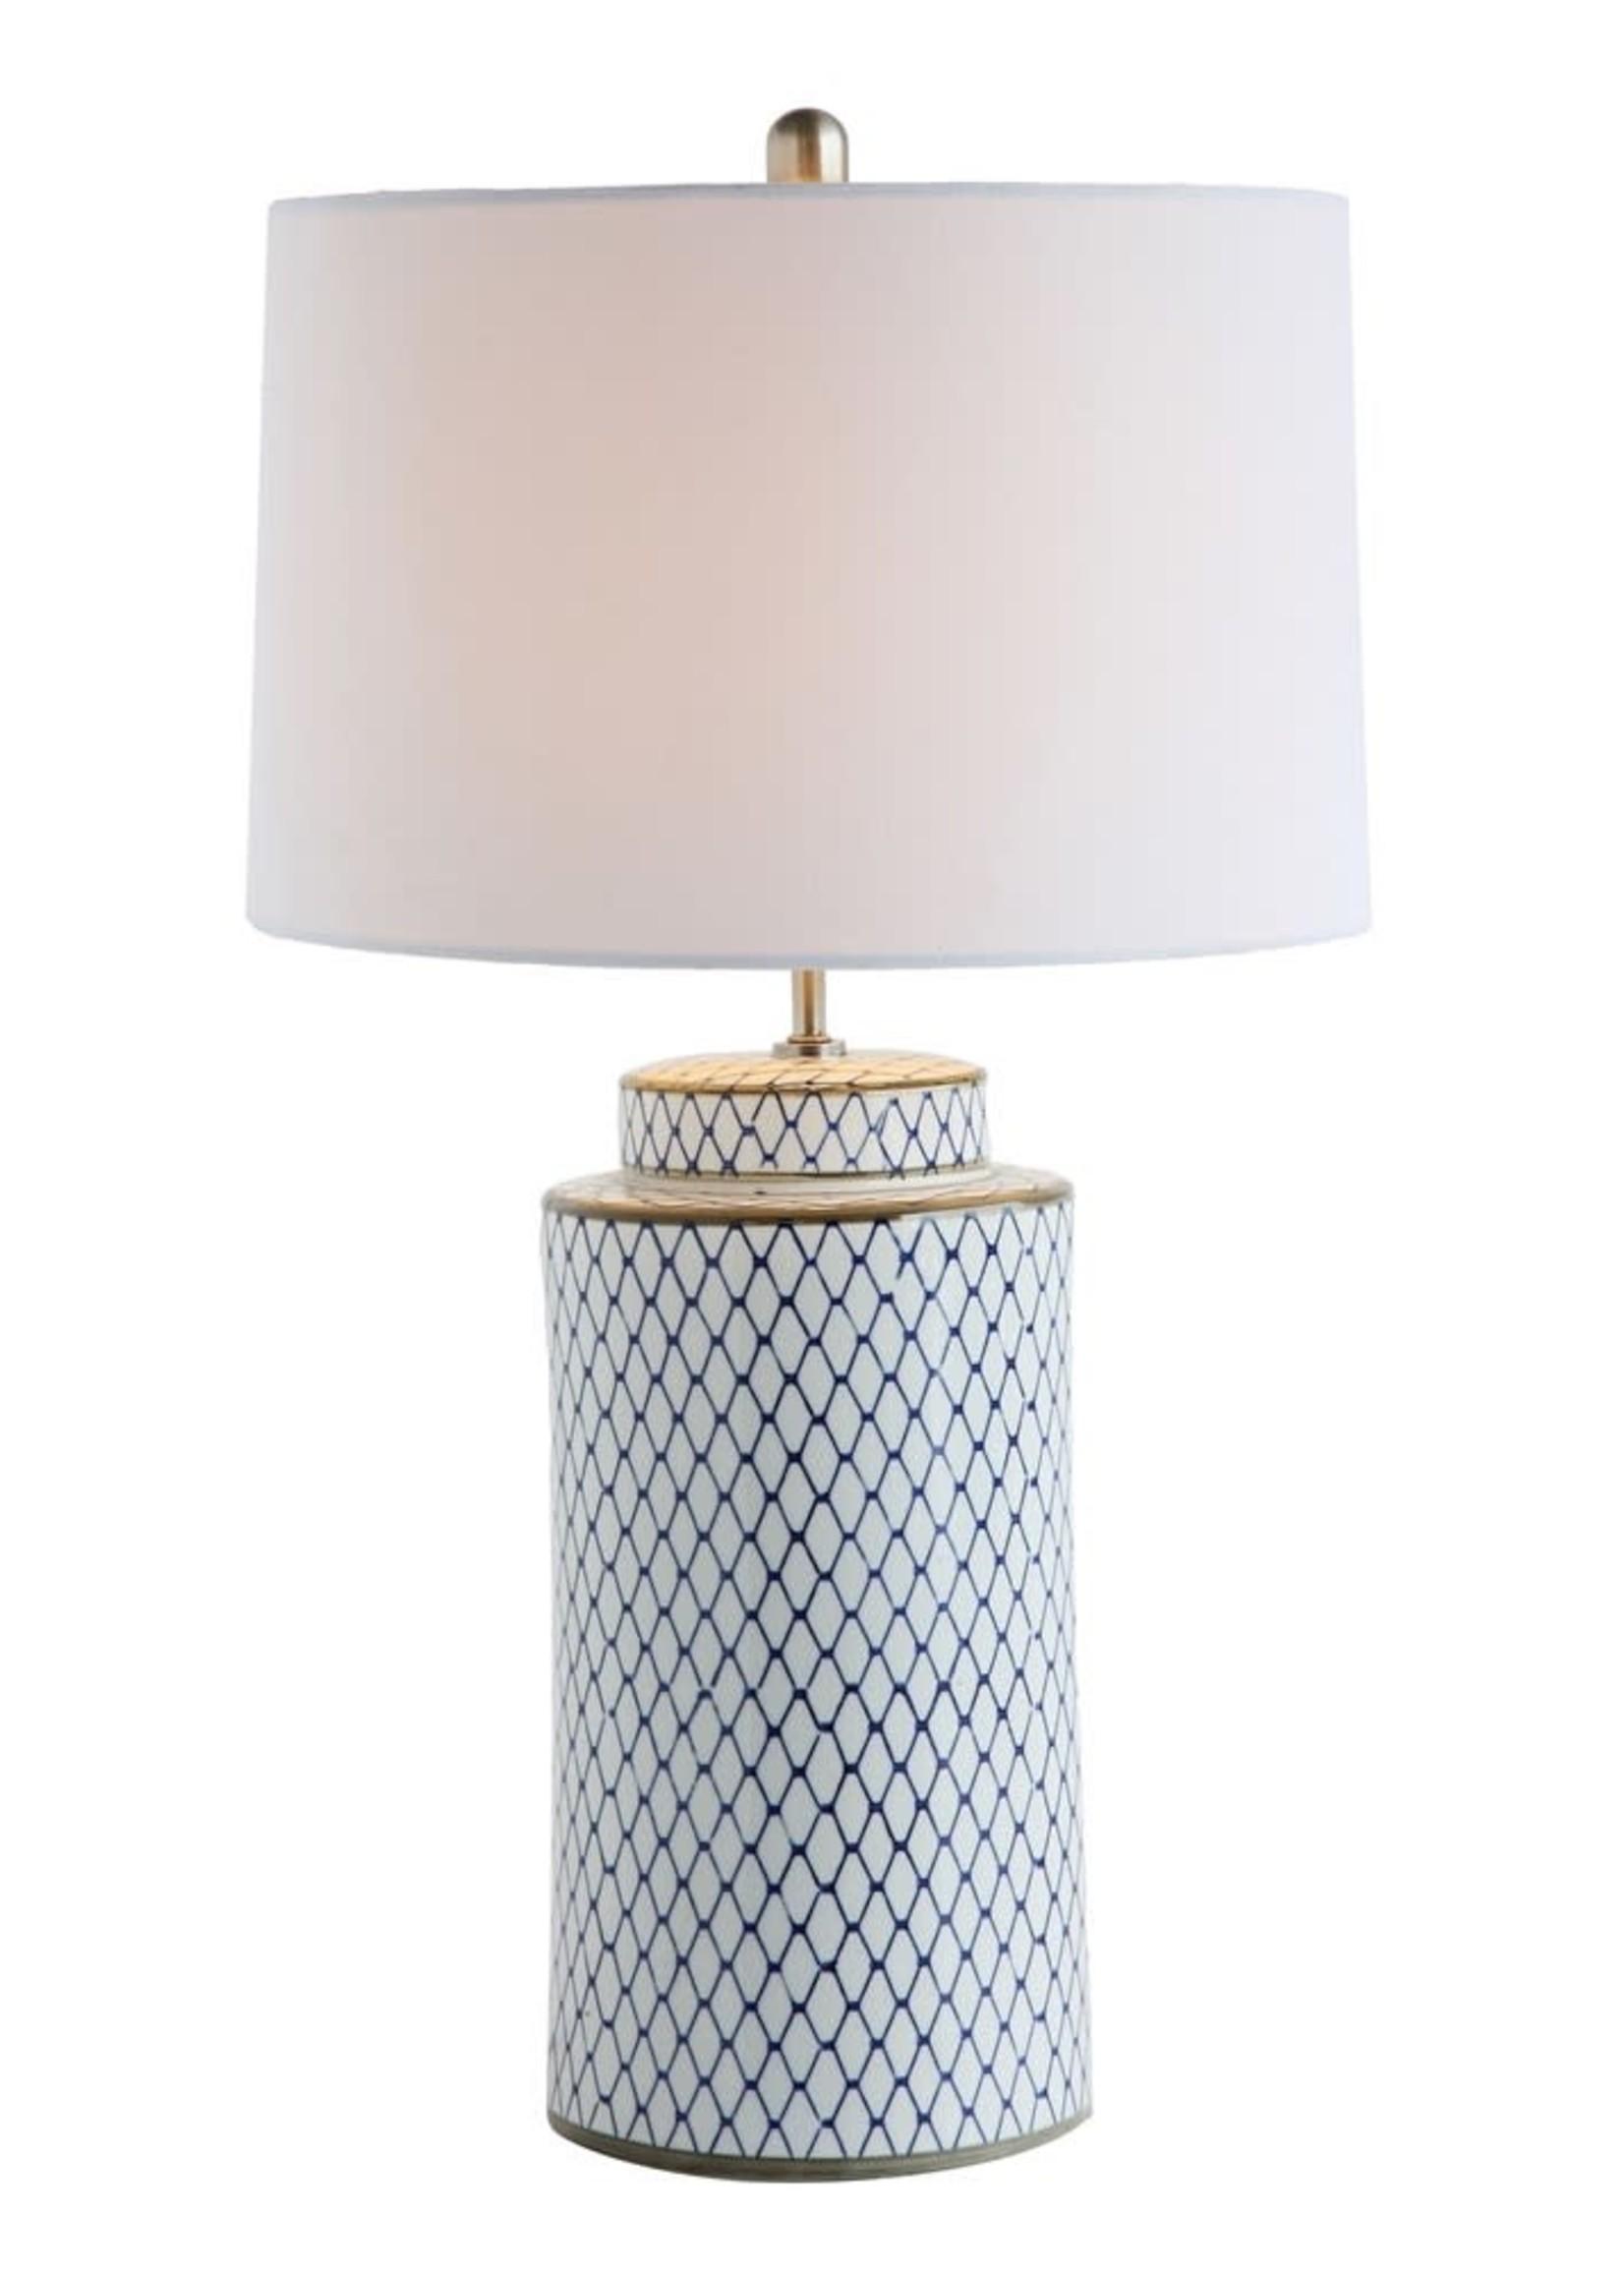 Ceramic Table Lamp w/ Linen Shade, Indigo & White